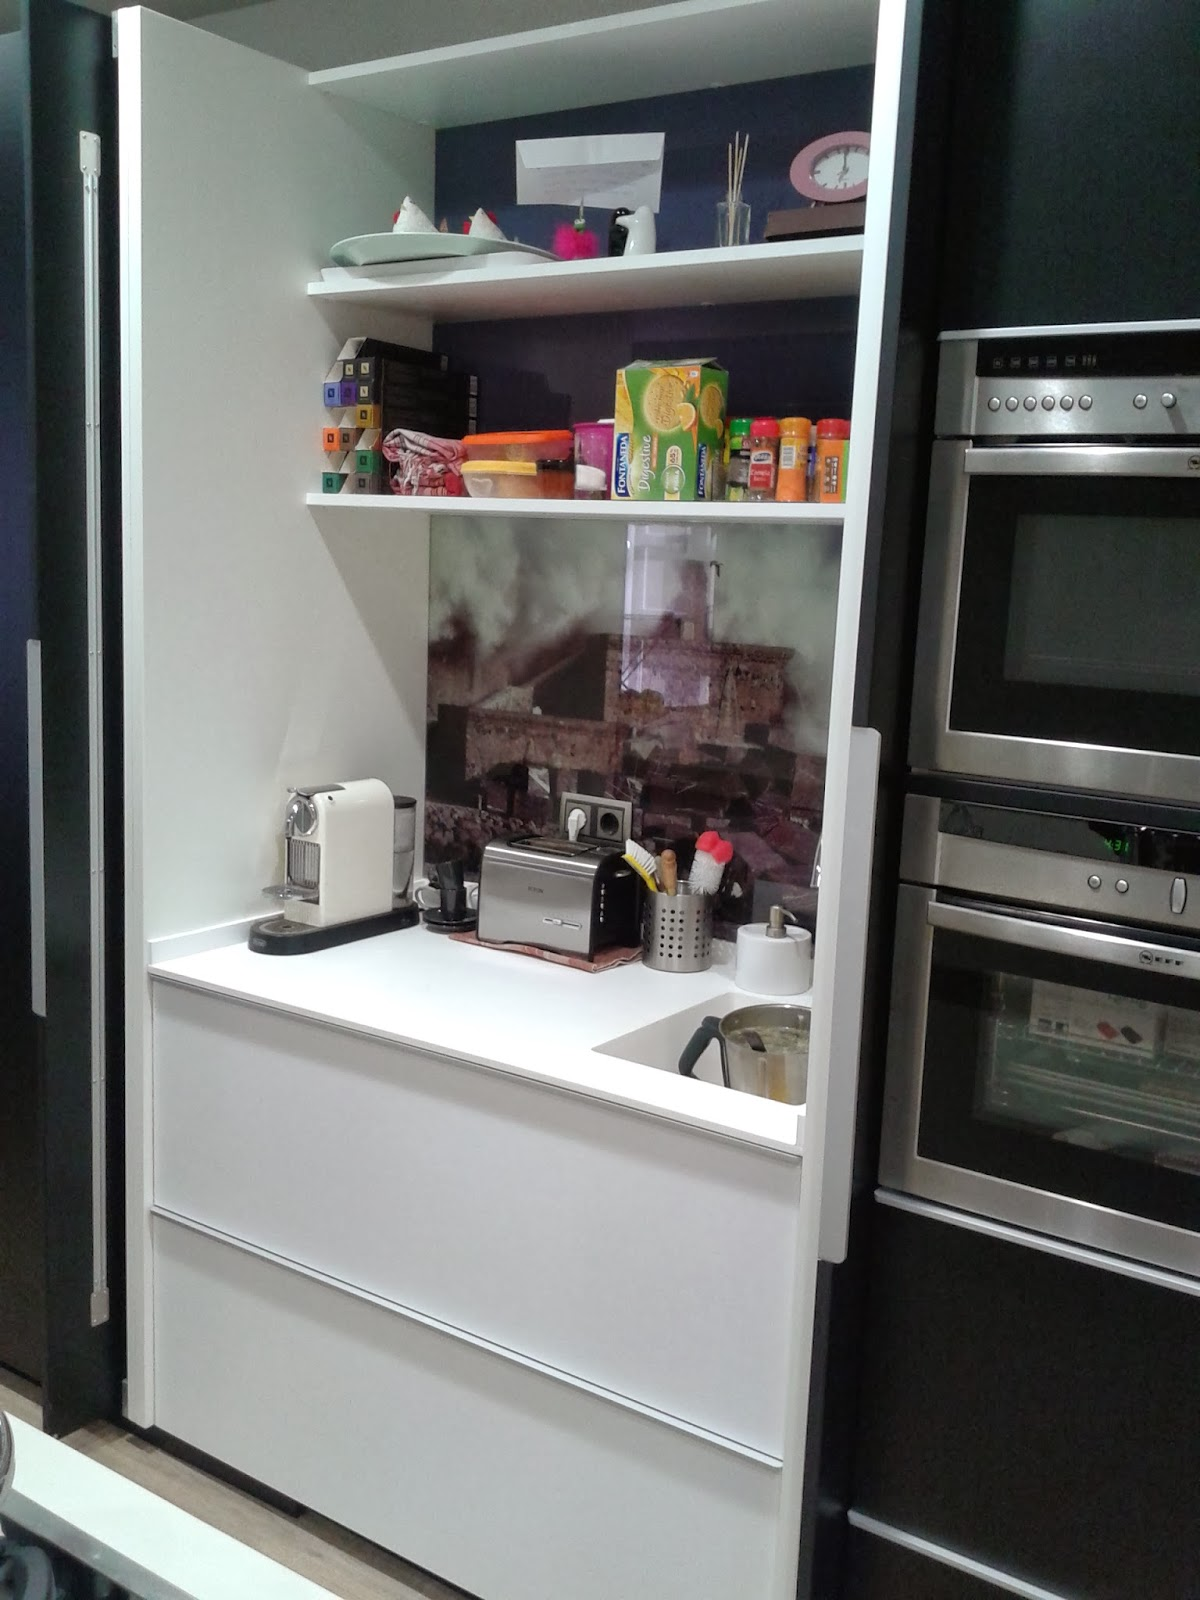 Essenblog proyecto en alfonso ix - Columna horno y microondas ...